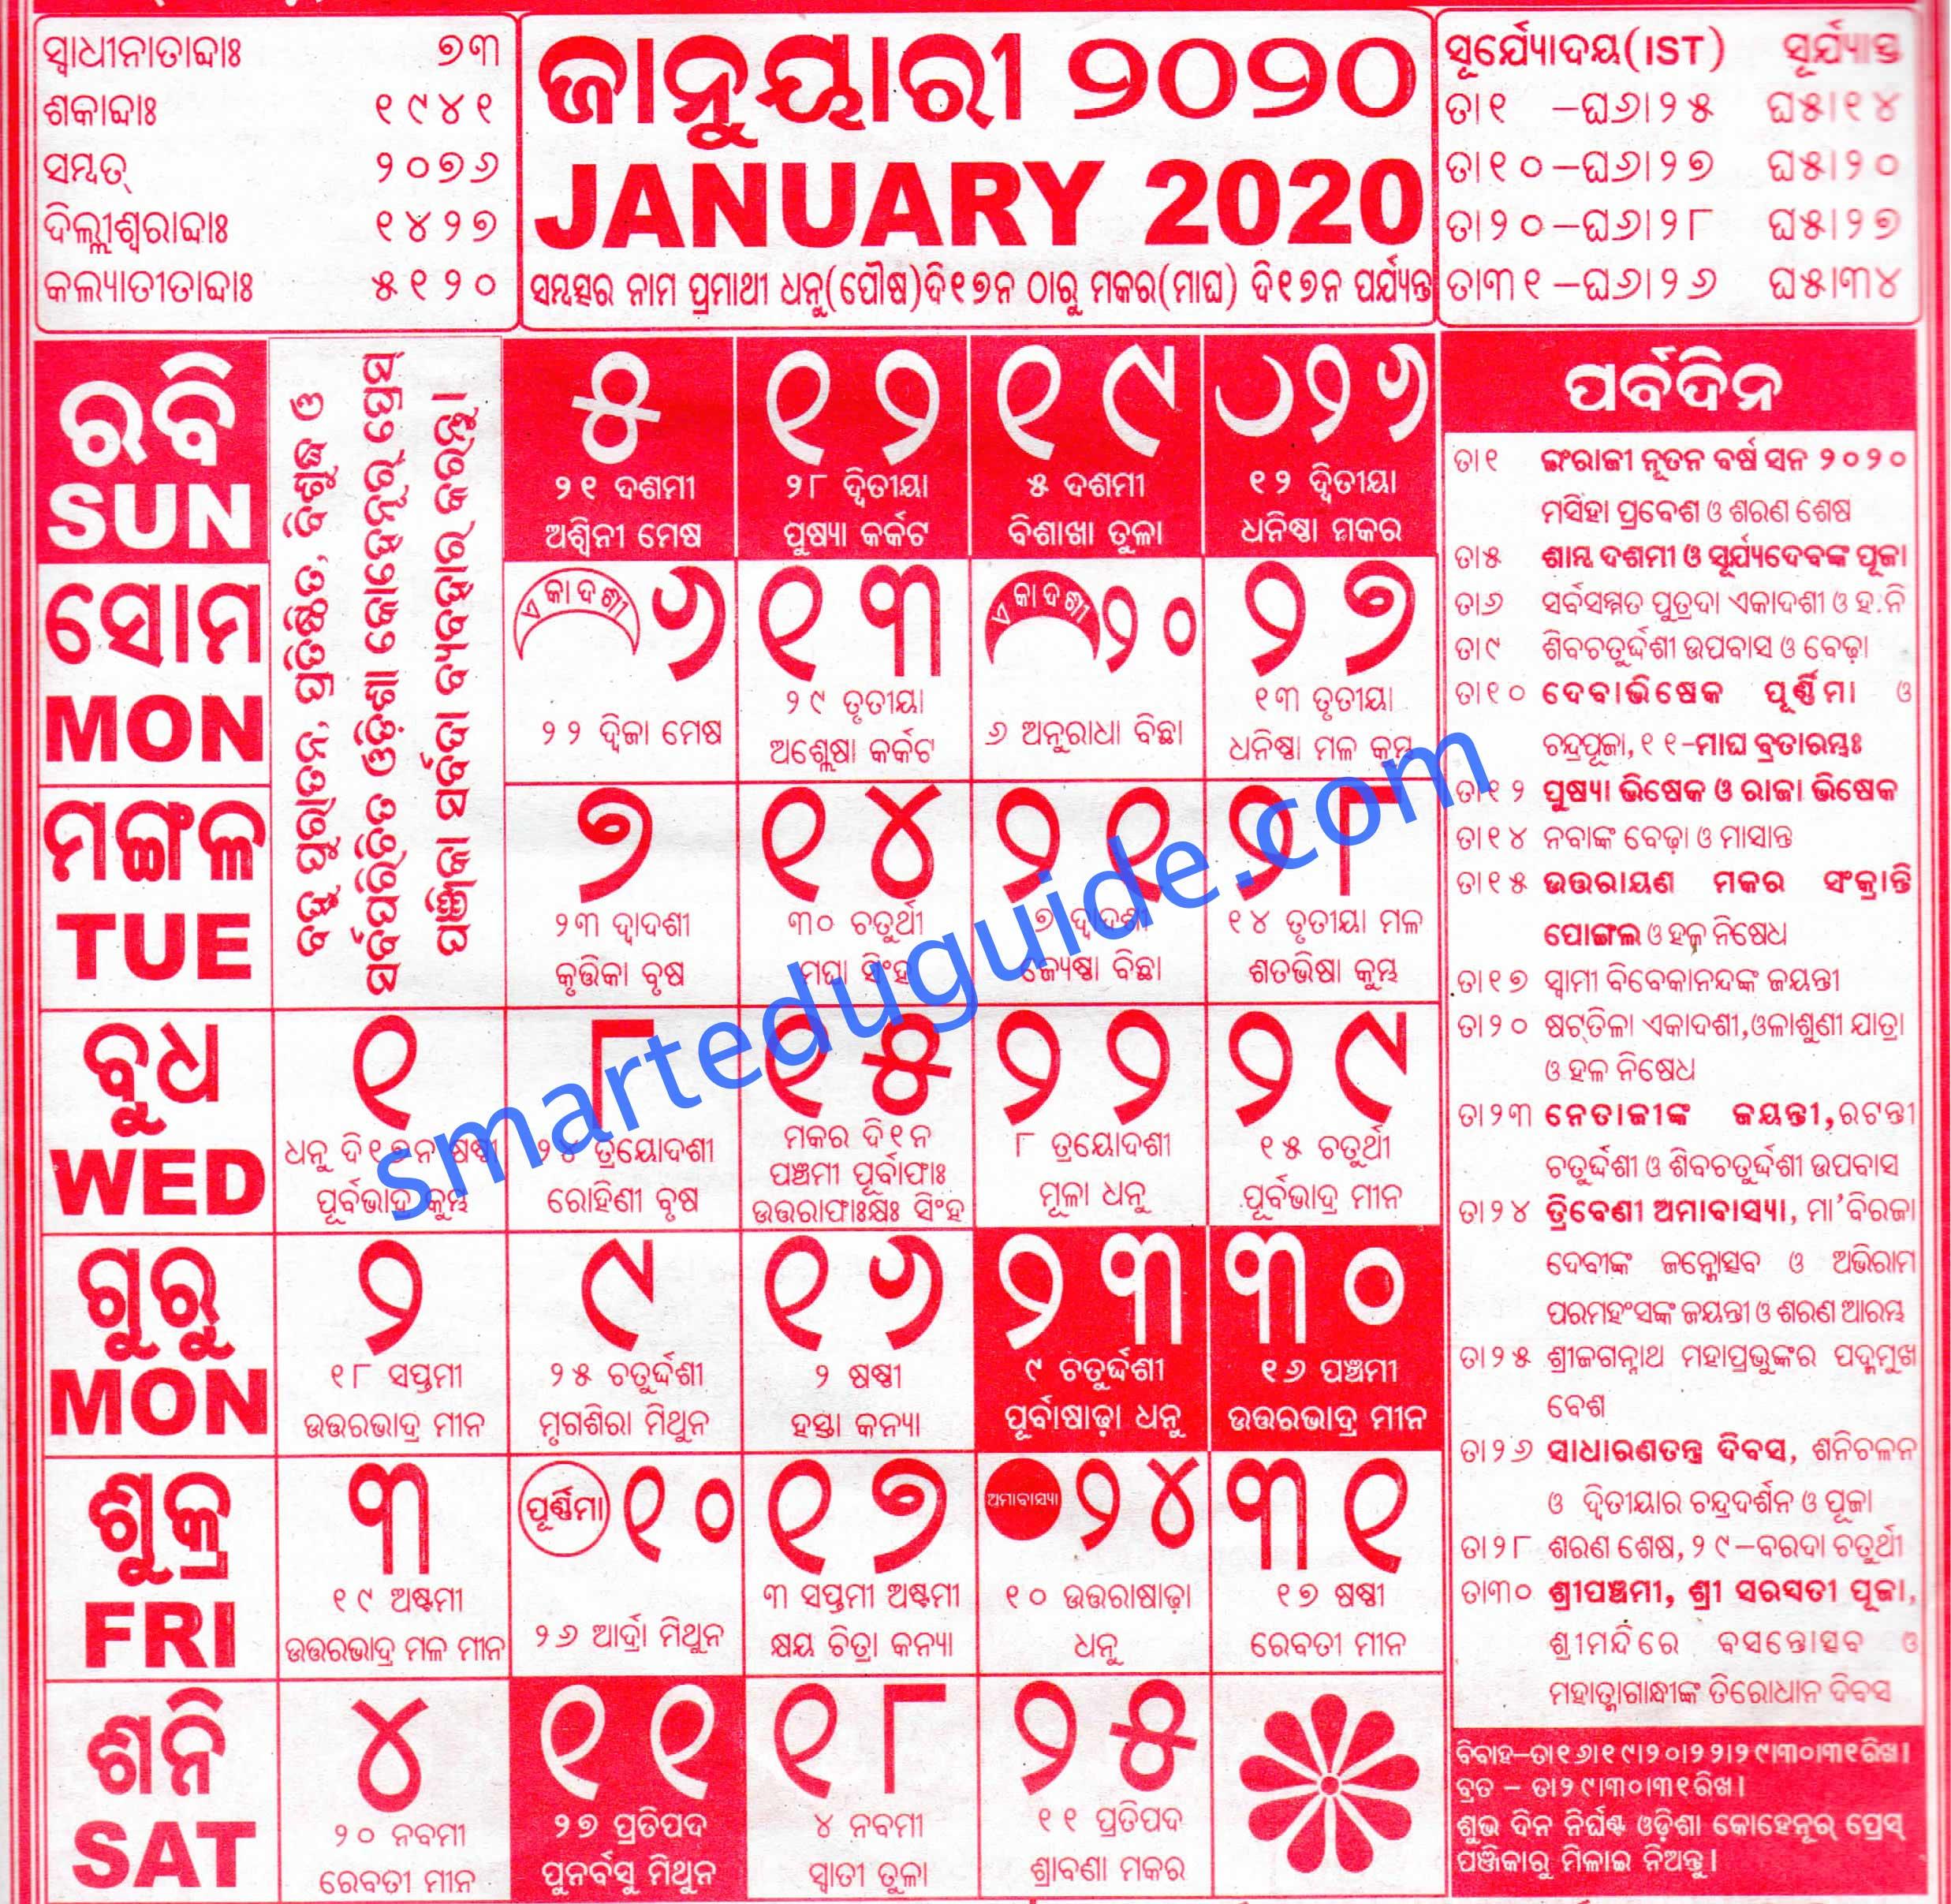 Odia Calendar 2020 Kohinoor Pdf | Seg regarding Odia Calendar February 2020